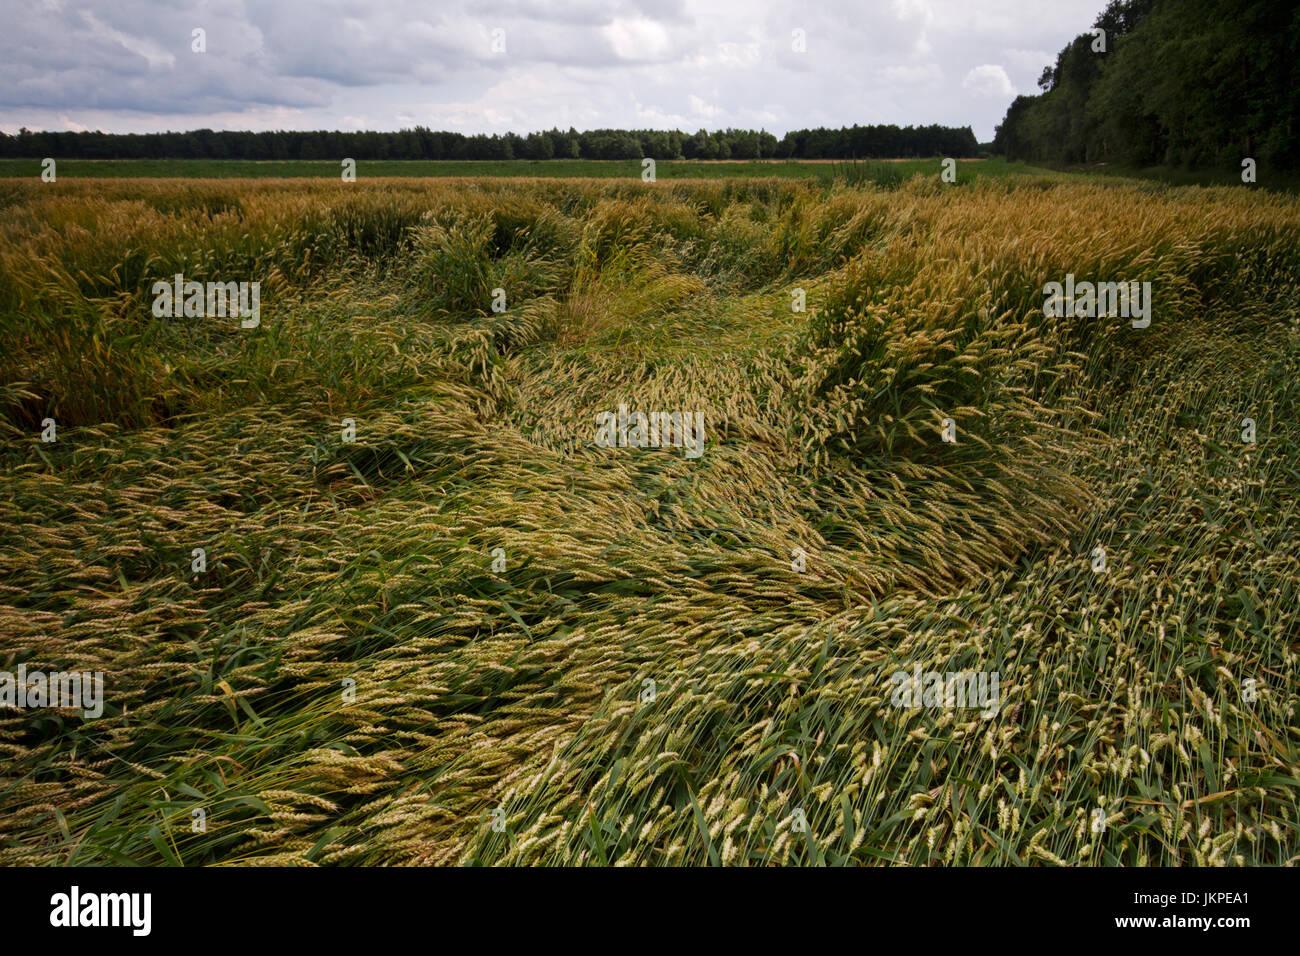 Barley crop flattened by wind and rain under a dark sky - Stock Image